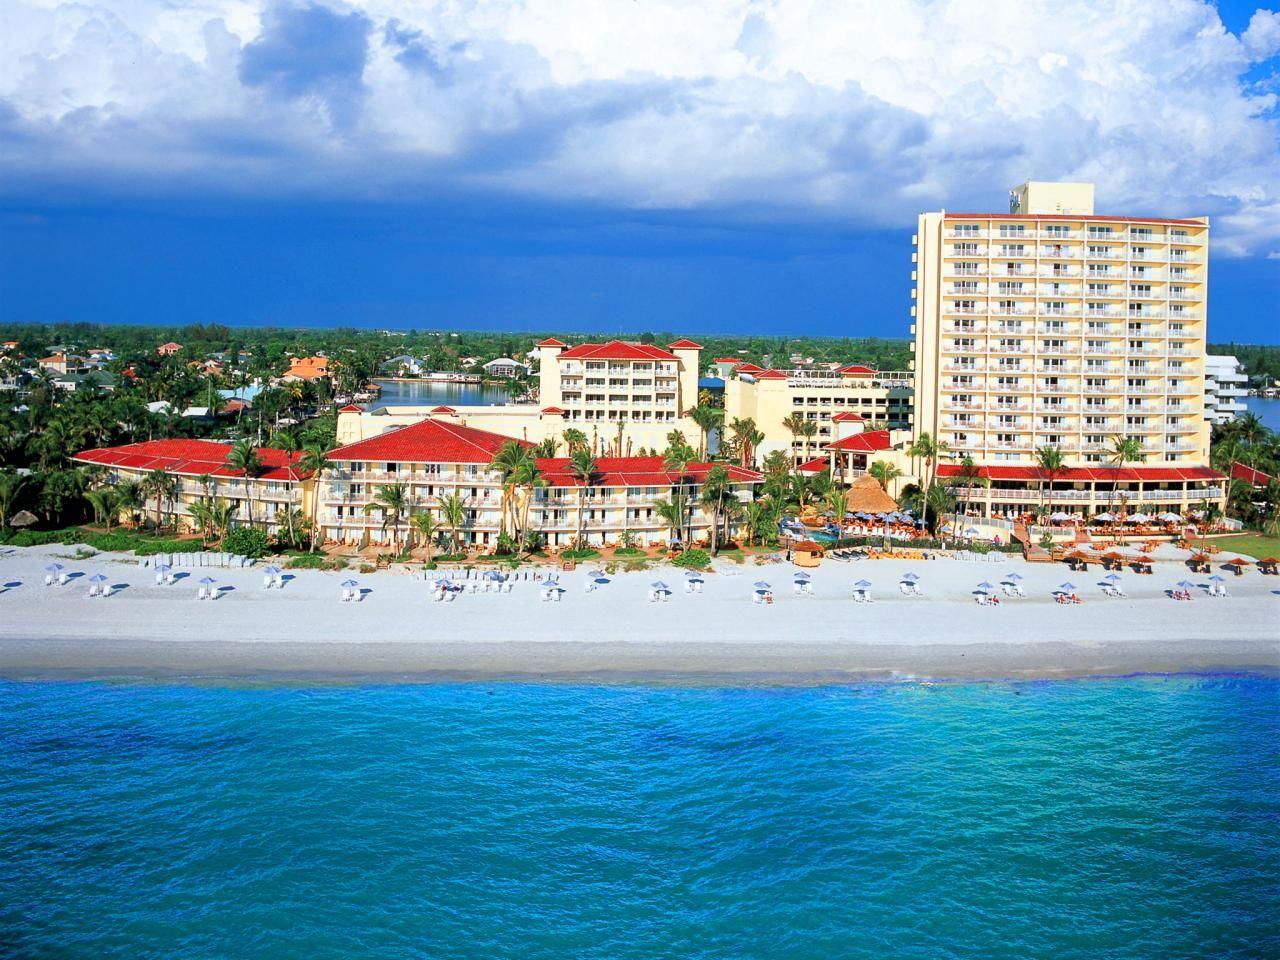 Best Kitchen Gallery: Florida's Best Beachfront Hotels Florida Travelchannel of Florida Keys Hotels And Resorts  on rachelxblog.com